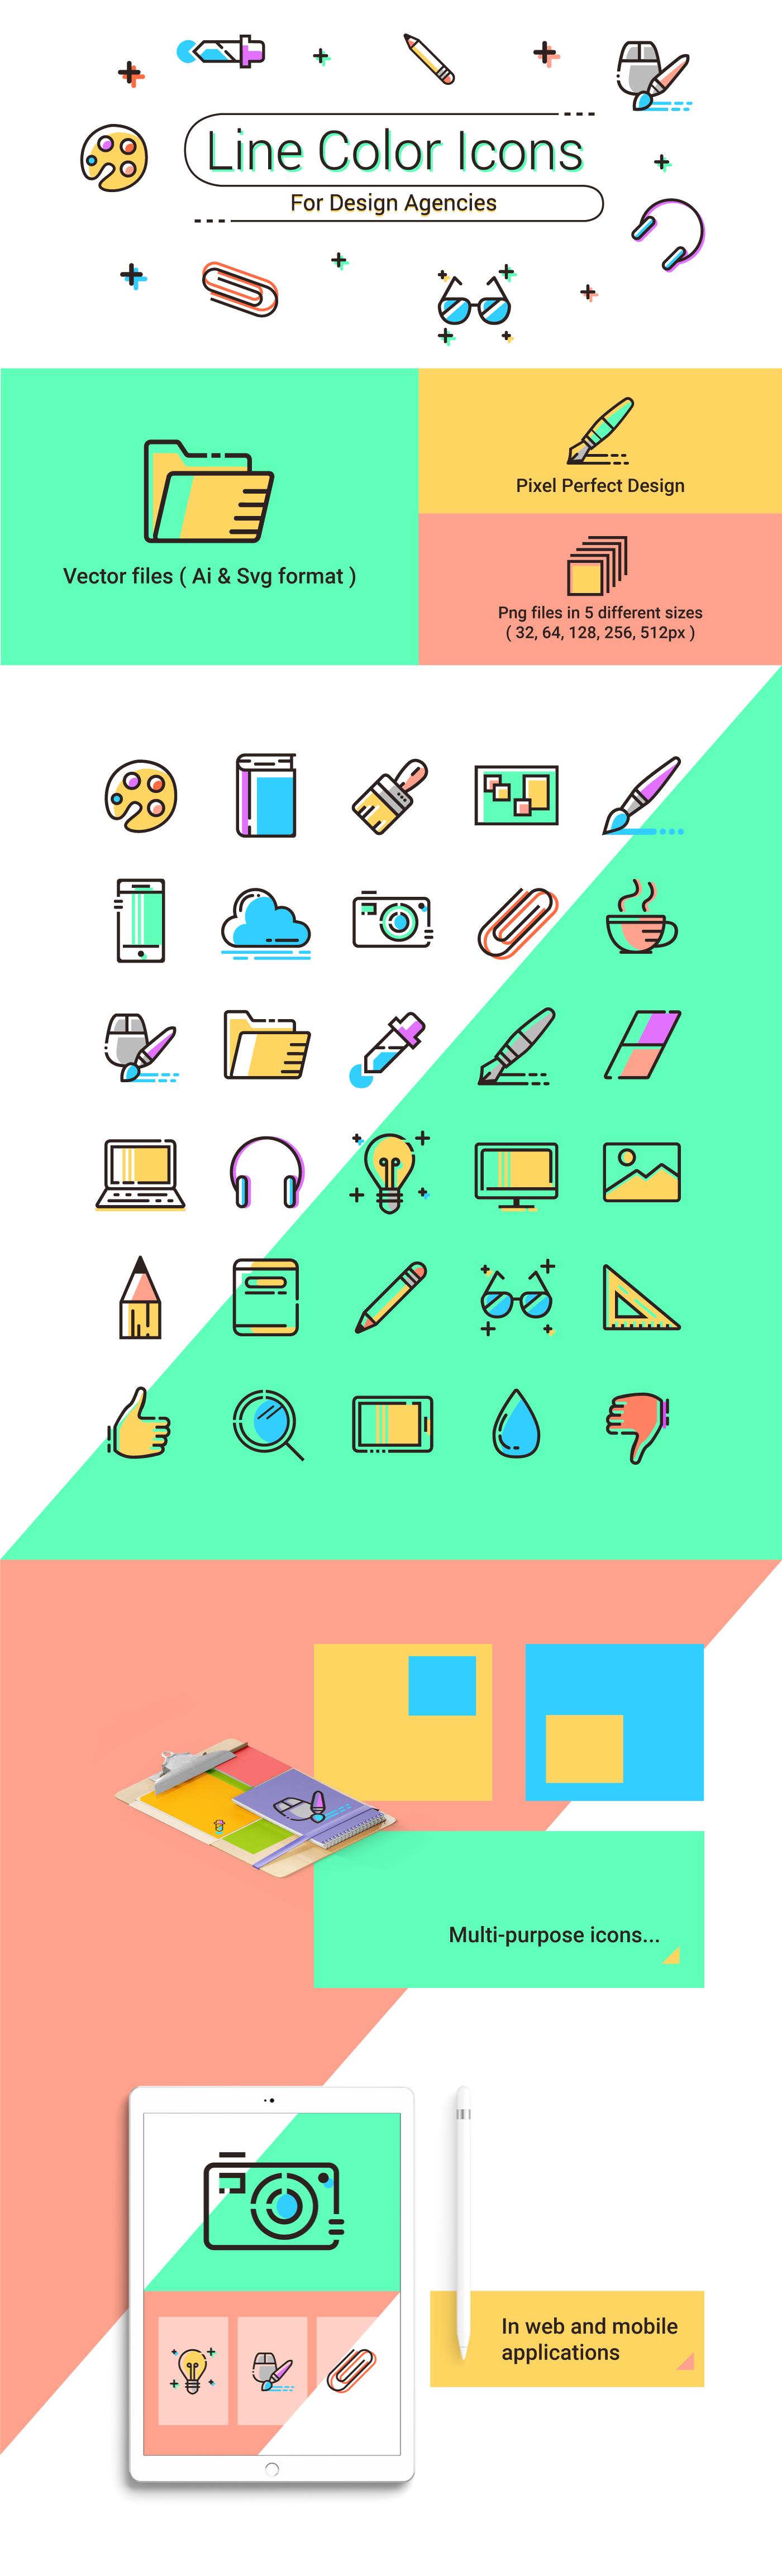 design_agencies_free_icon_set_1